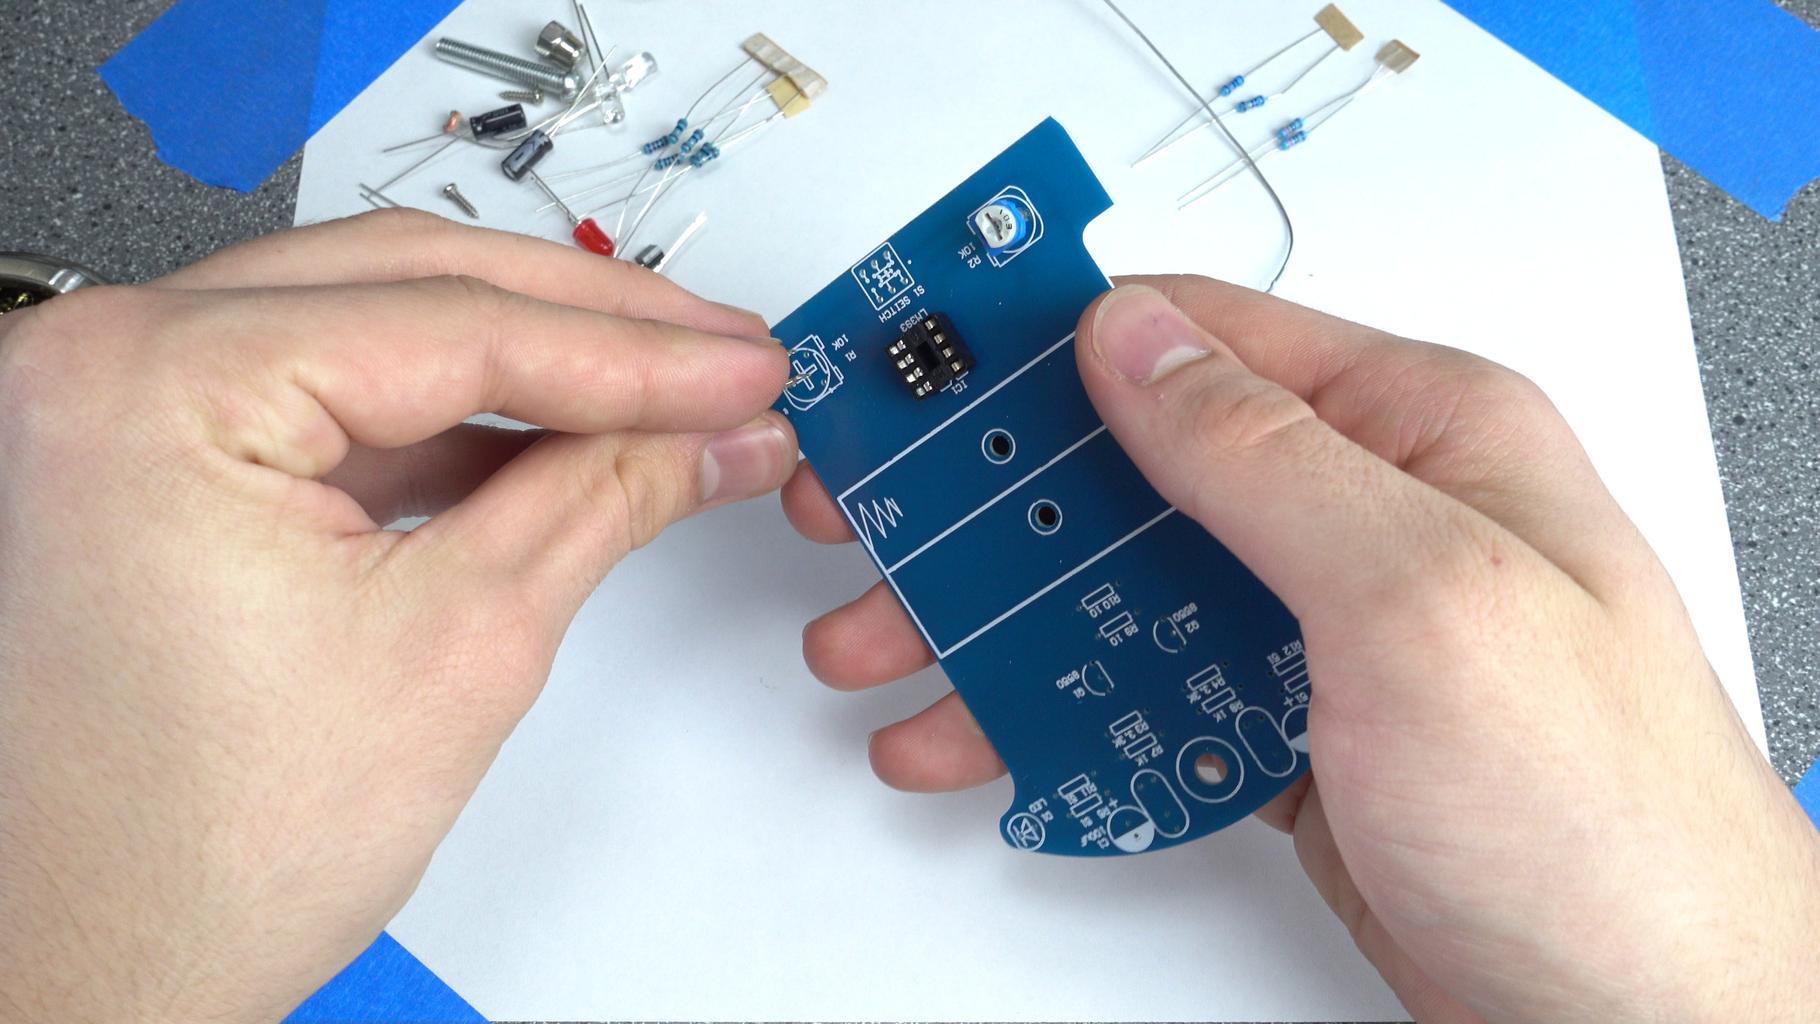 Soldering: IC Socket, Potentiometers